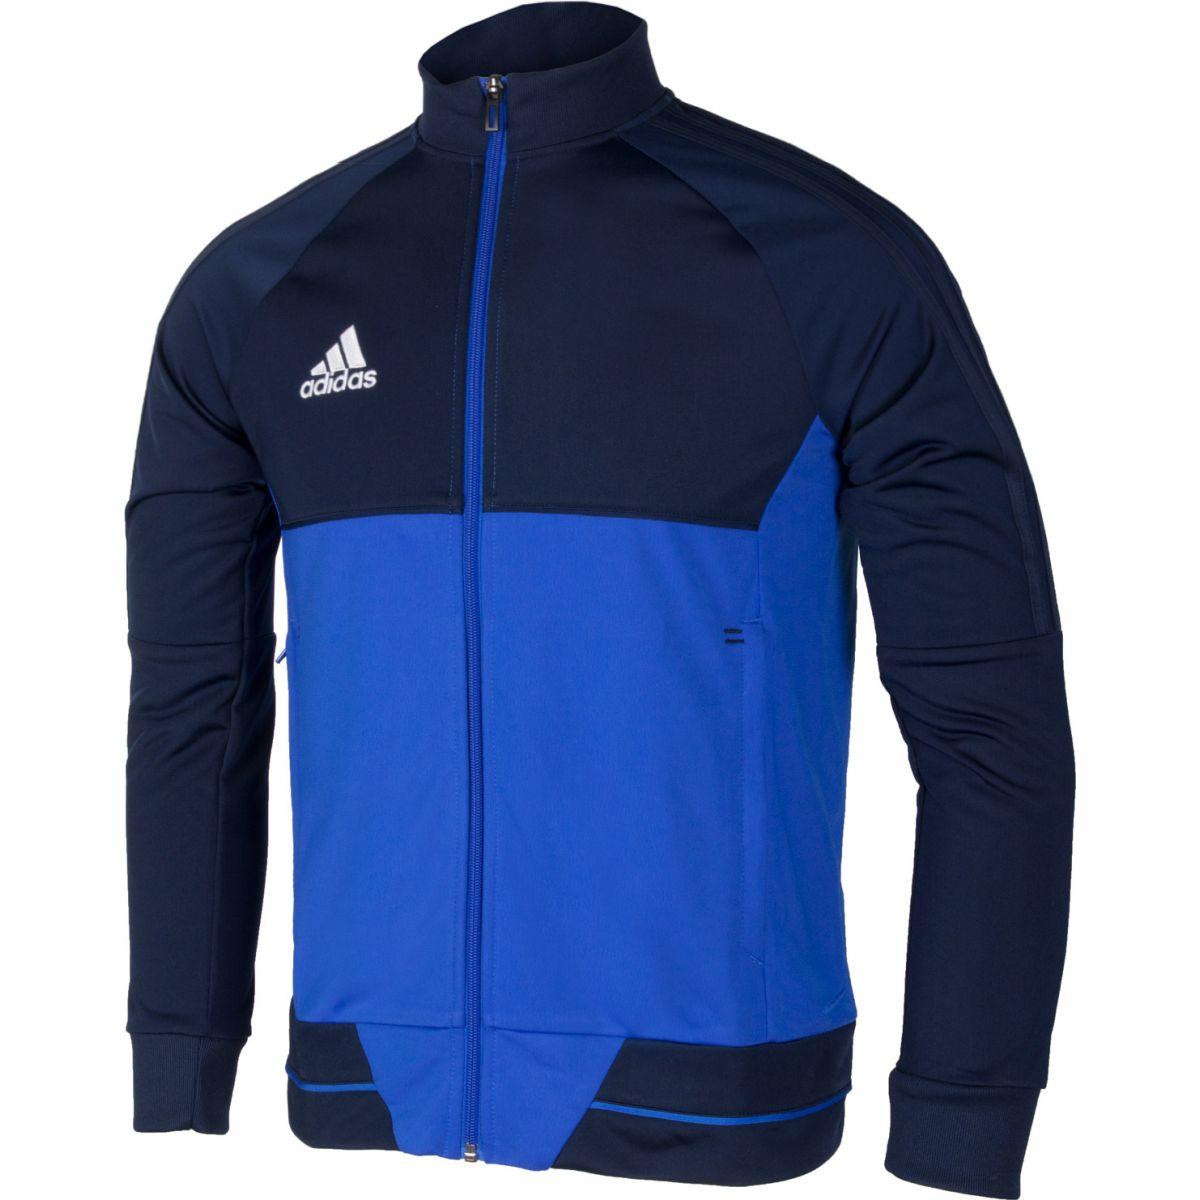 ad08378f1 Bluza adidas Tiro 17 Junior BQ2610 164 - 7444338483 - oficjalne ...